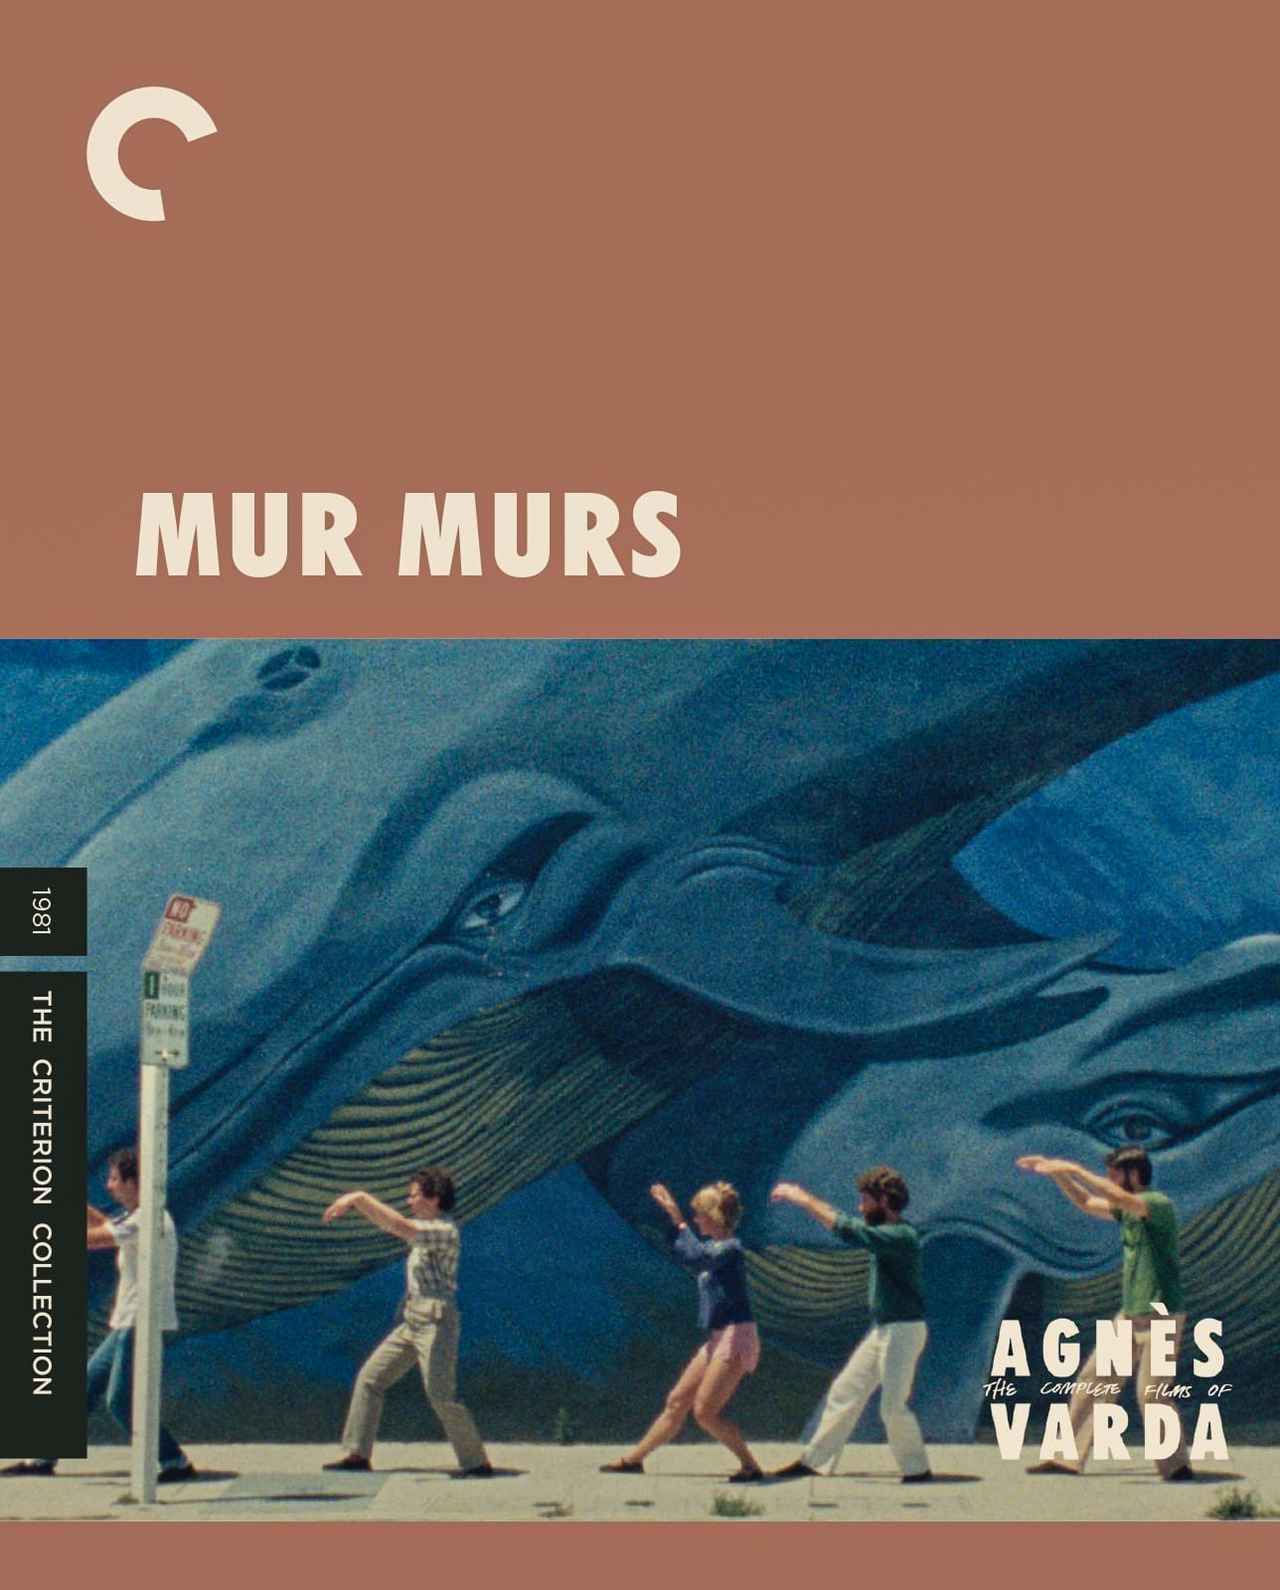 画像: MURAL MURALS aka. Mur Murs (1981) 壁画